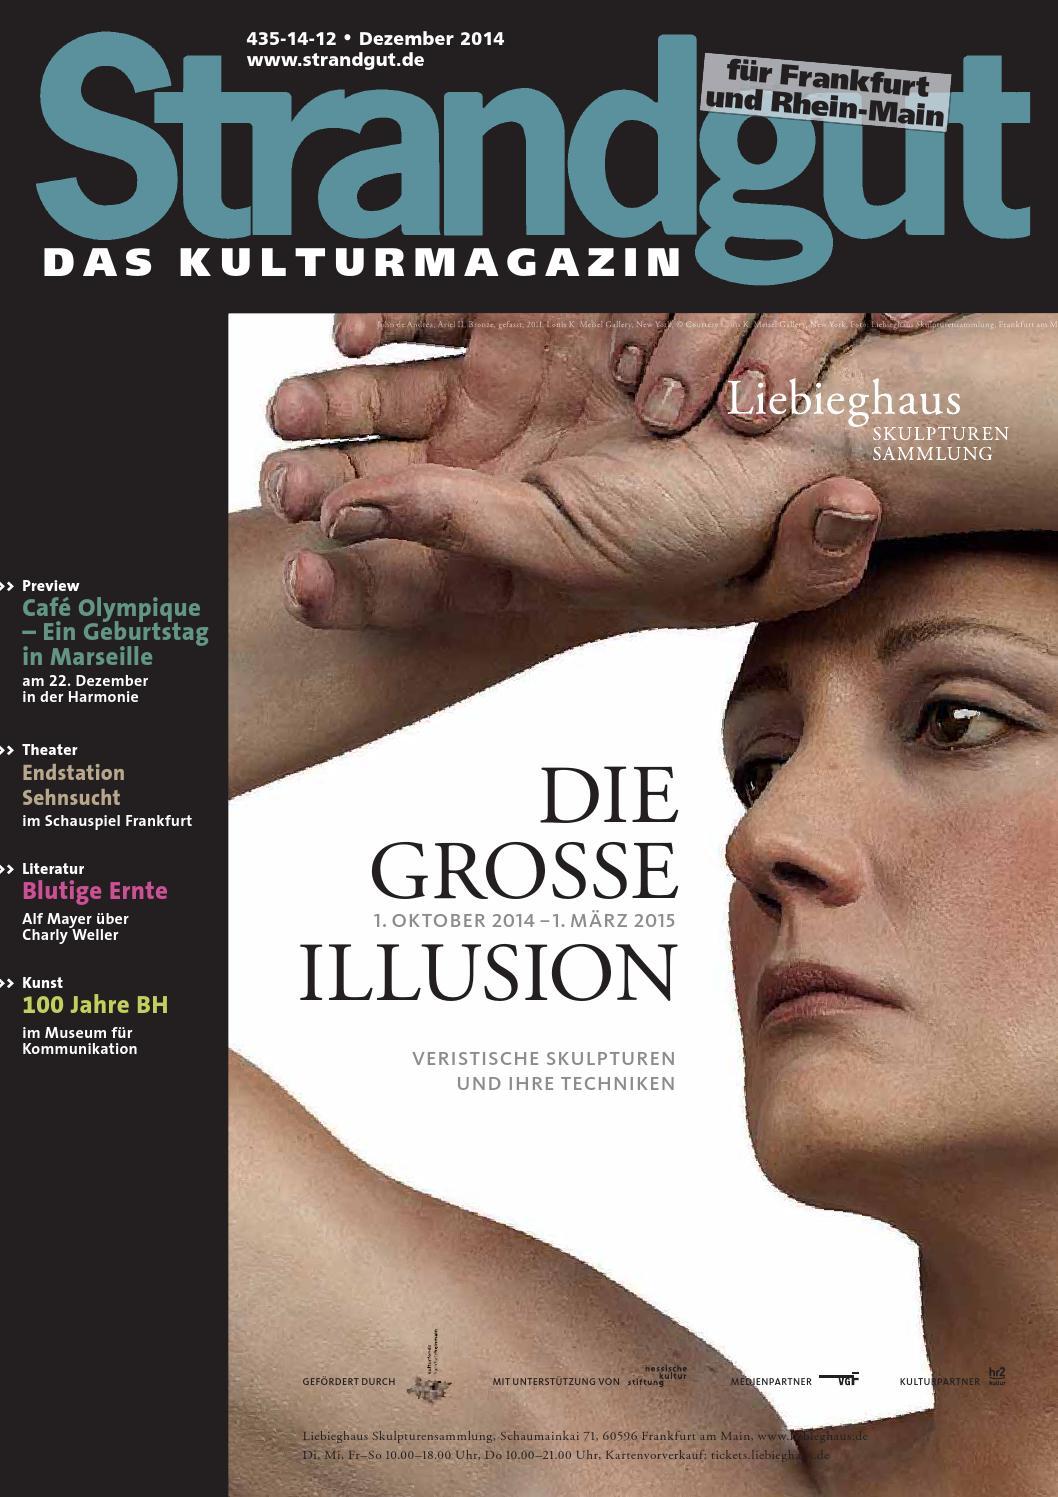 Strandgut Kulturmagazin 12/2014 by Strandgut Kulturmagazin - issuu